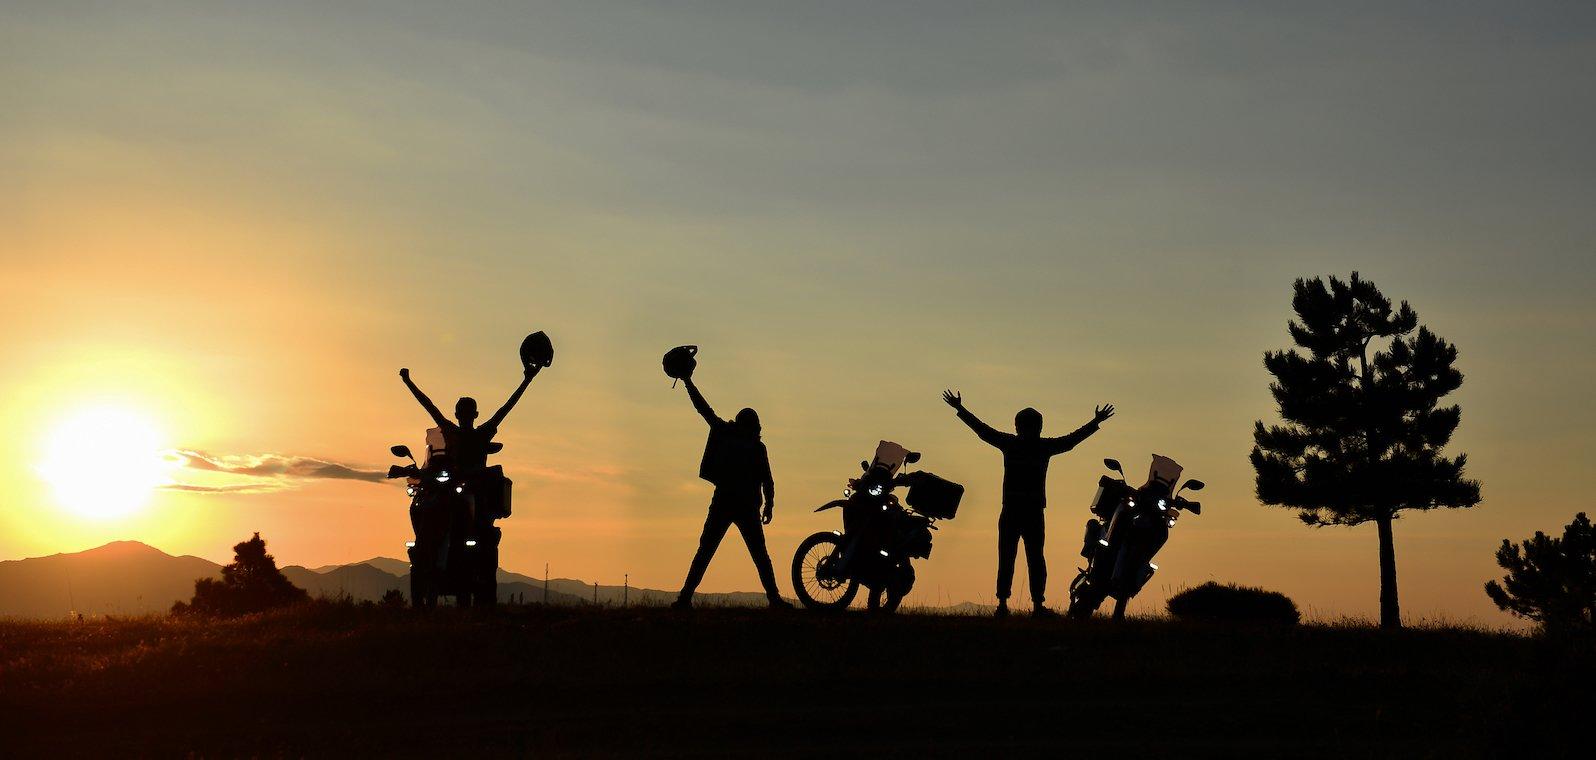 motorcycles tour 4venture adventure